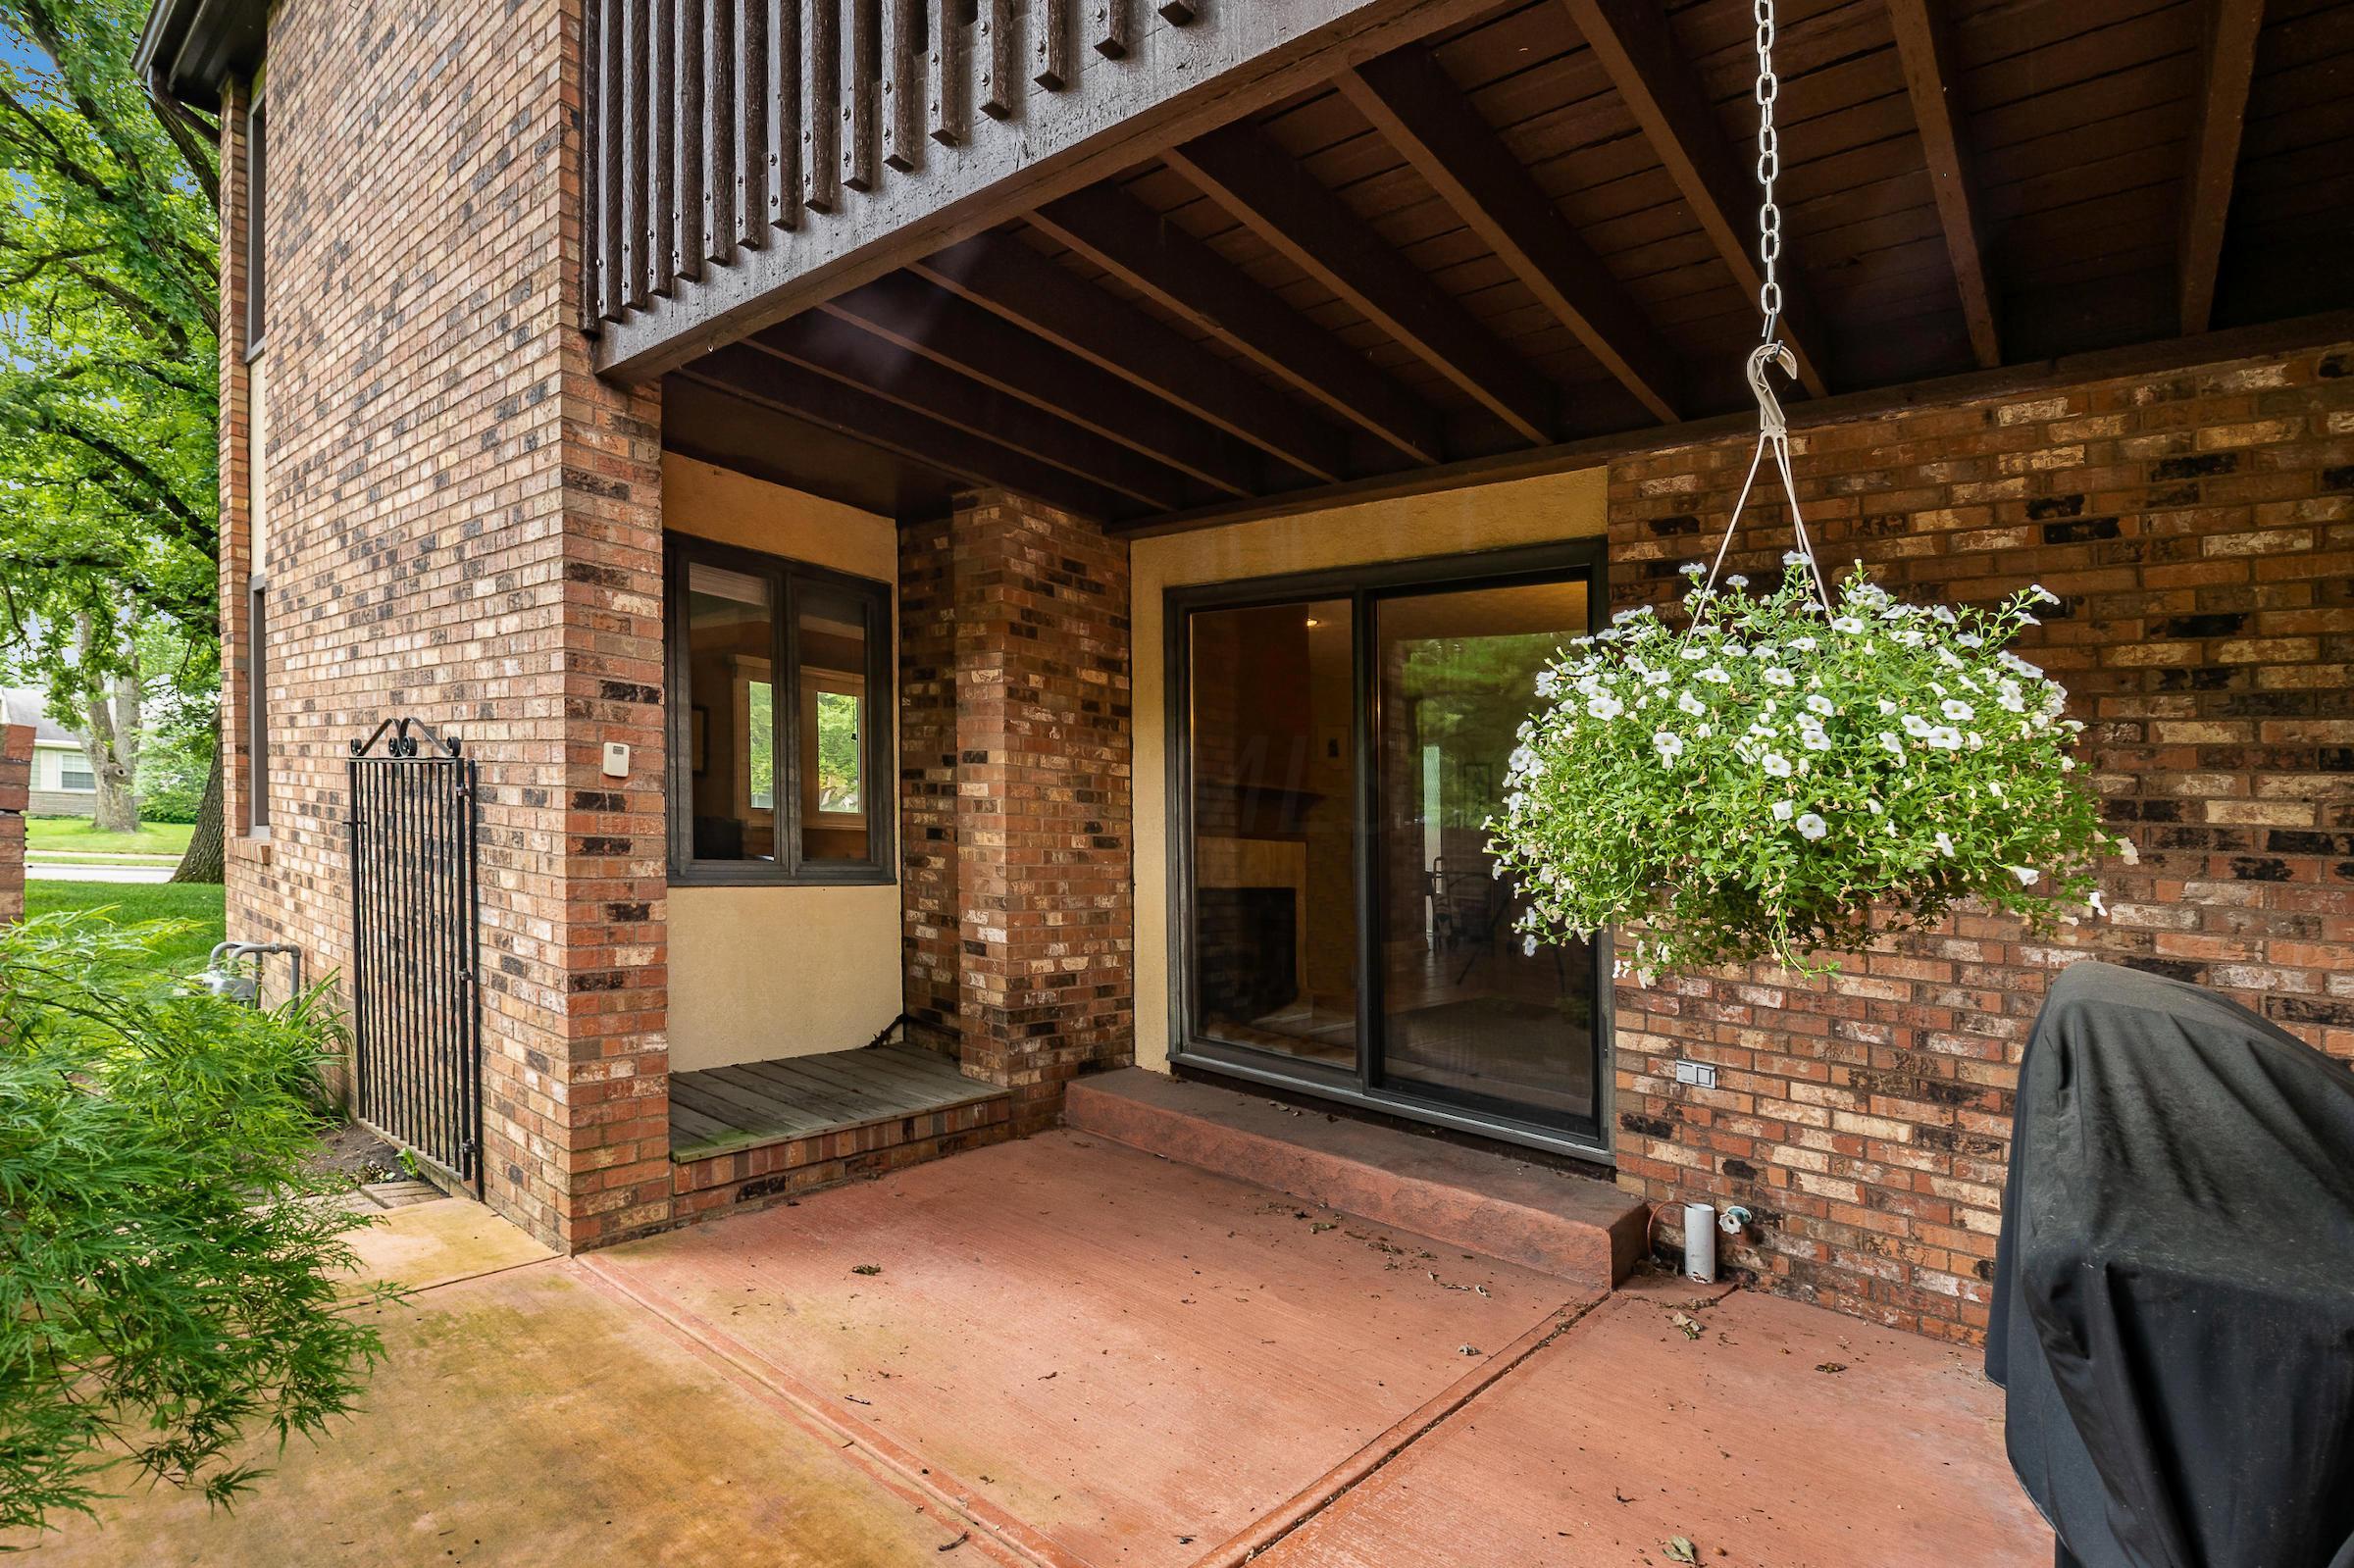 2422 Sherwood Villa, Upper Arlington, Ohio 43221, 3 Bedrooms Bedrooms, ,4 BathroomsBathrooms,Residential,For Sale,Sherwood Villa,220019744